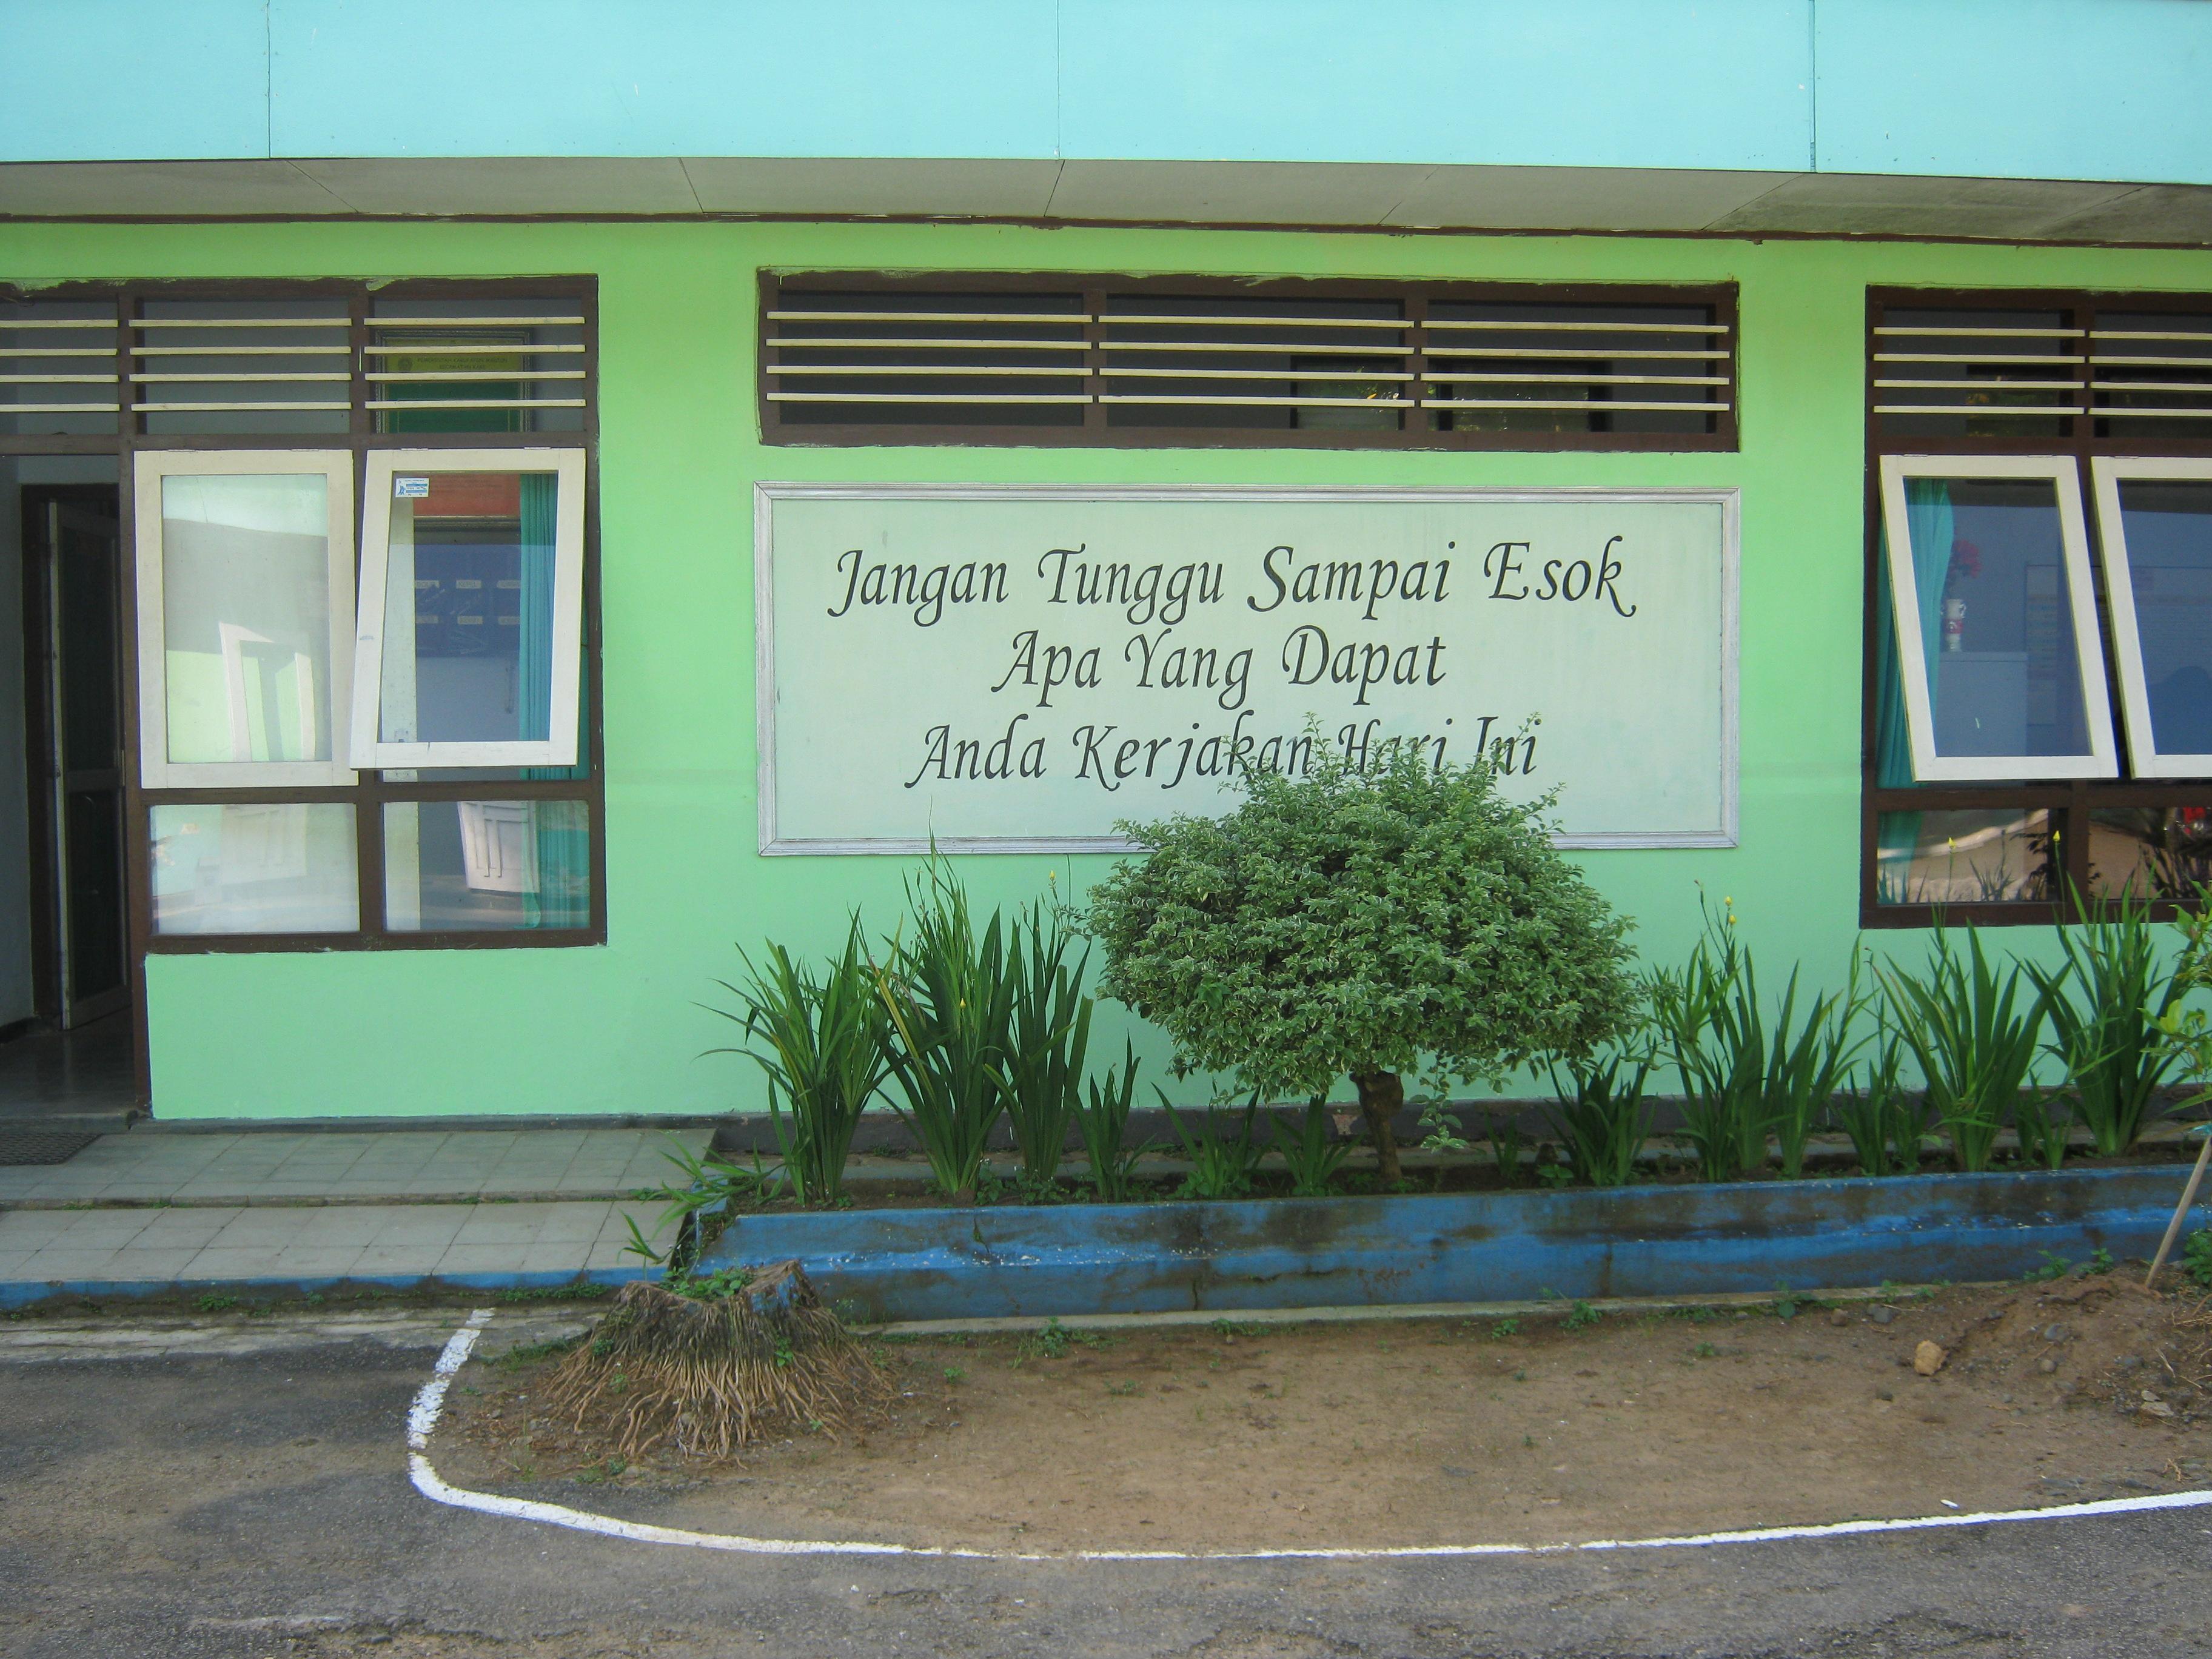 Website Kecamatan Kare Kabupaten Madiun Beranda Sendang Biru Kab